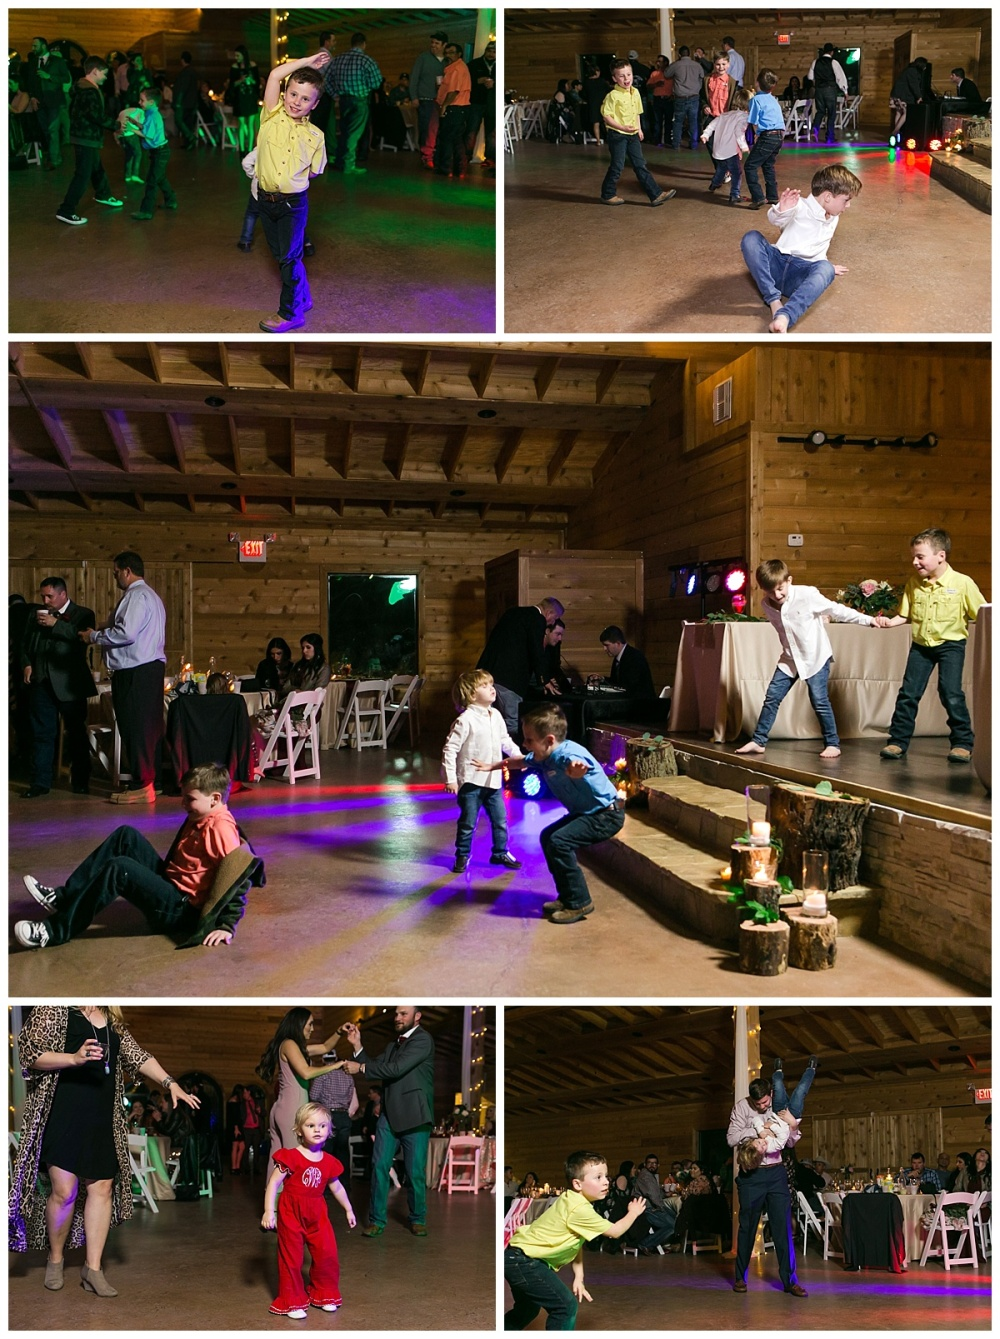 Carly-Barton-Photography-Geronimo-Oaks-Wedding-Venue-Texas-Hill-Country-Ronnie-Sarah_0132.jpg